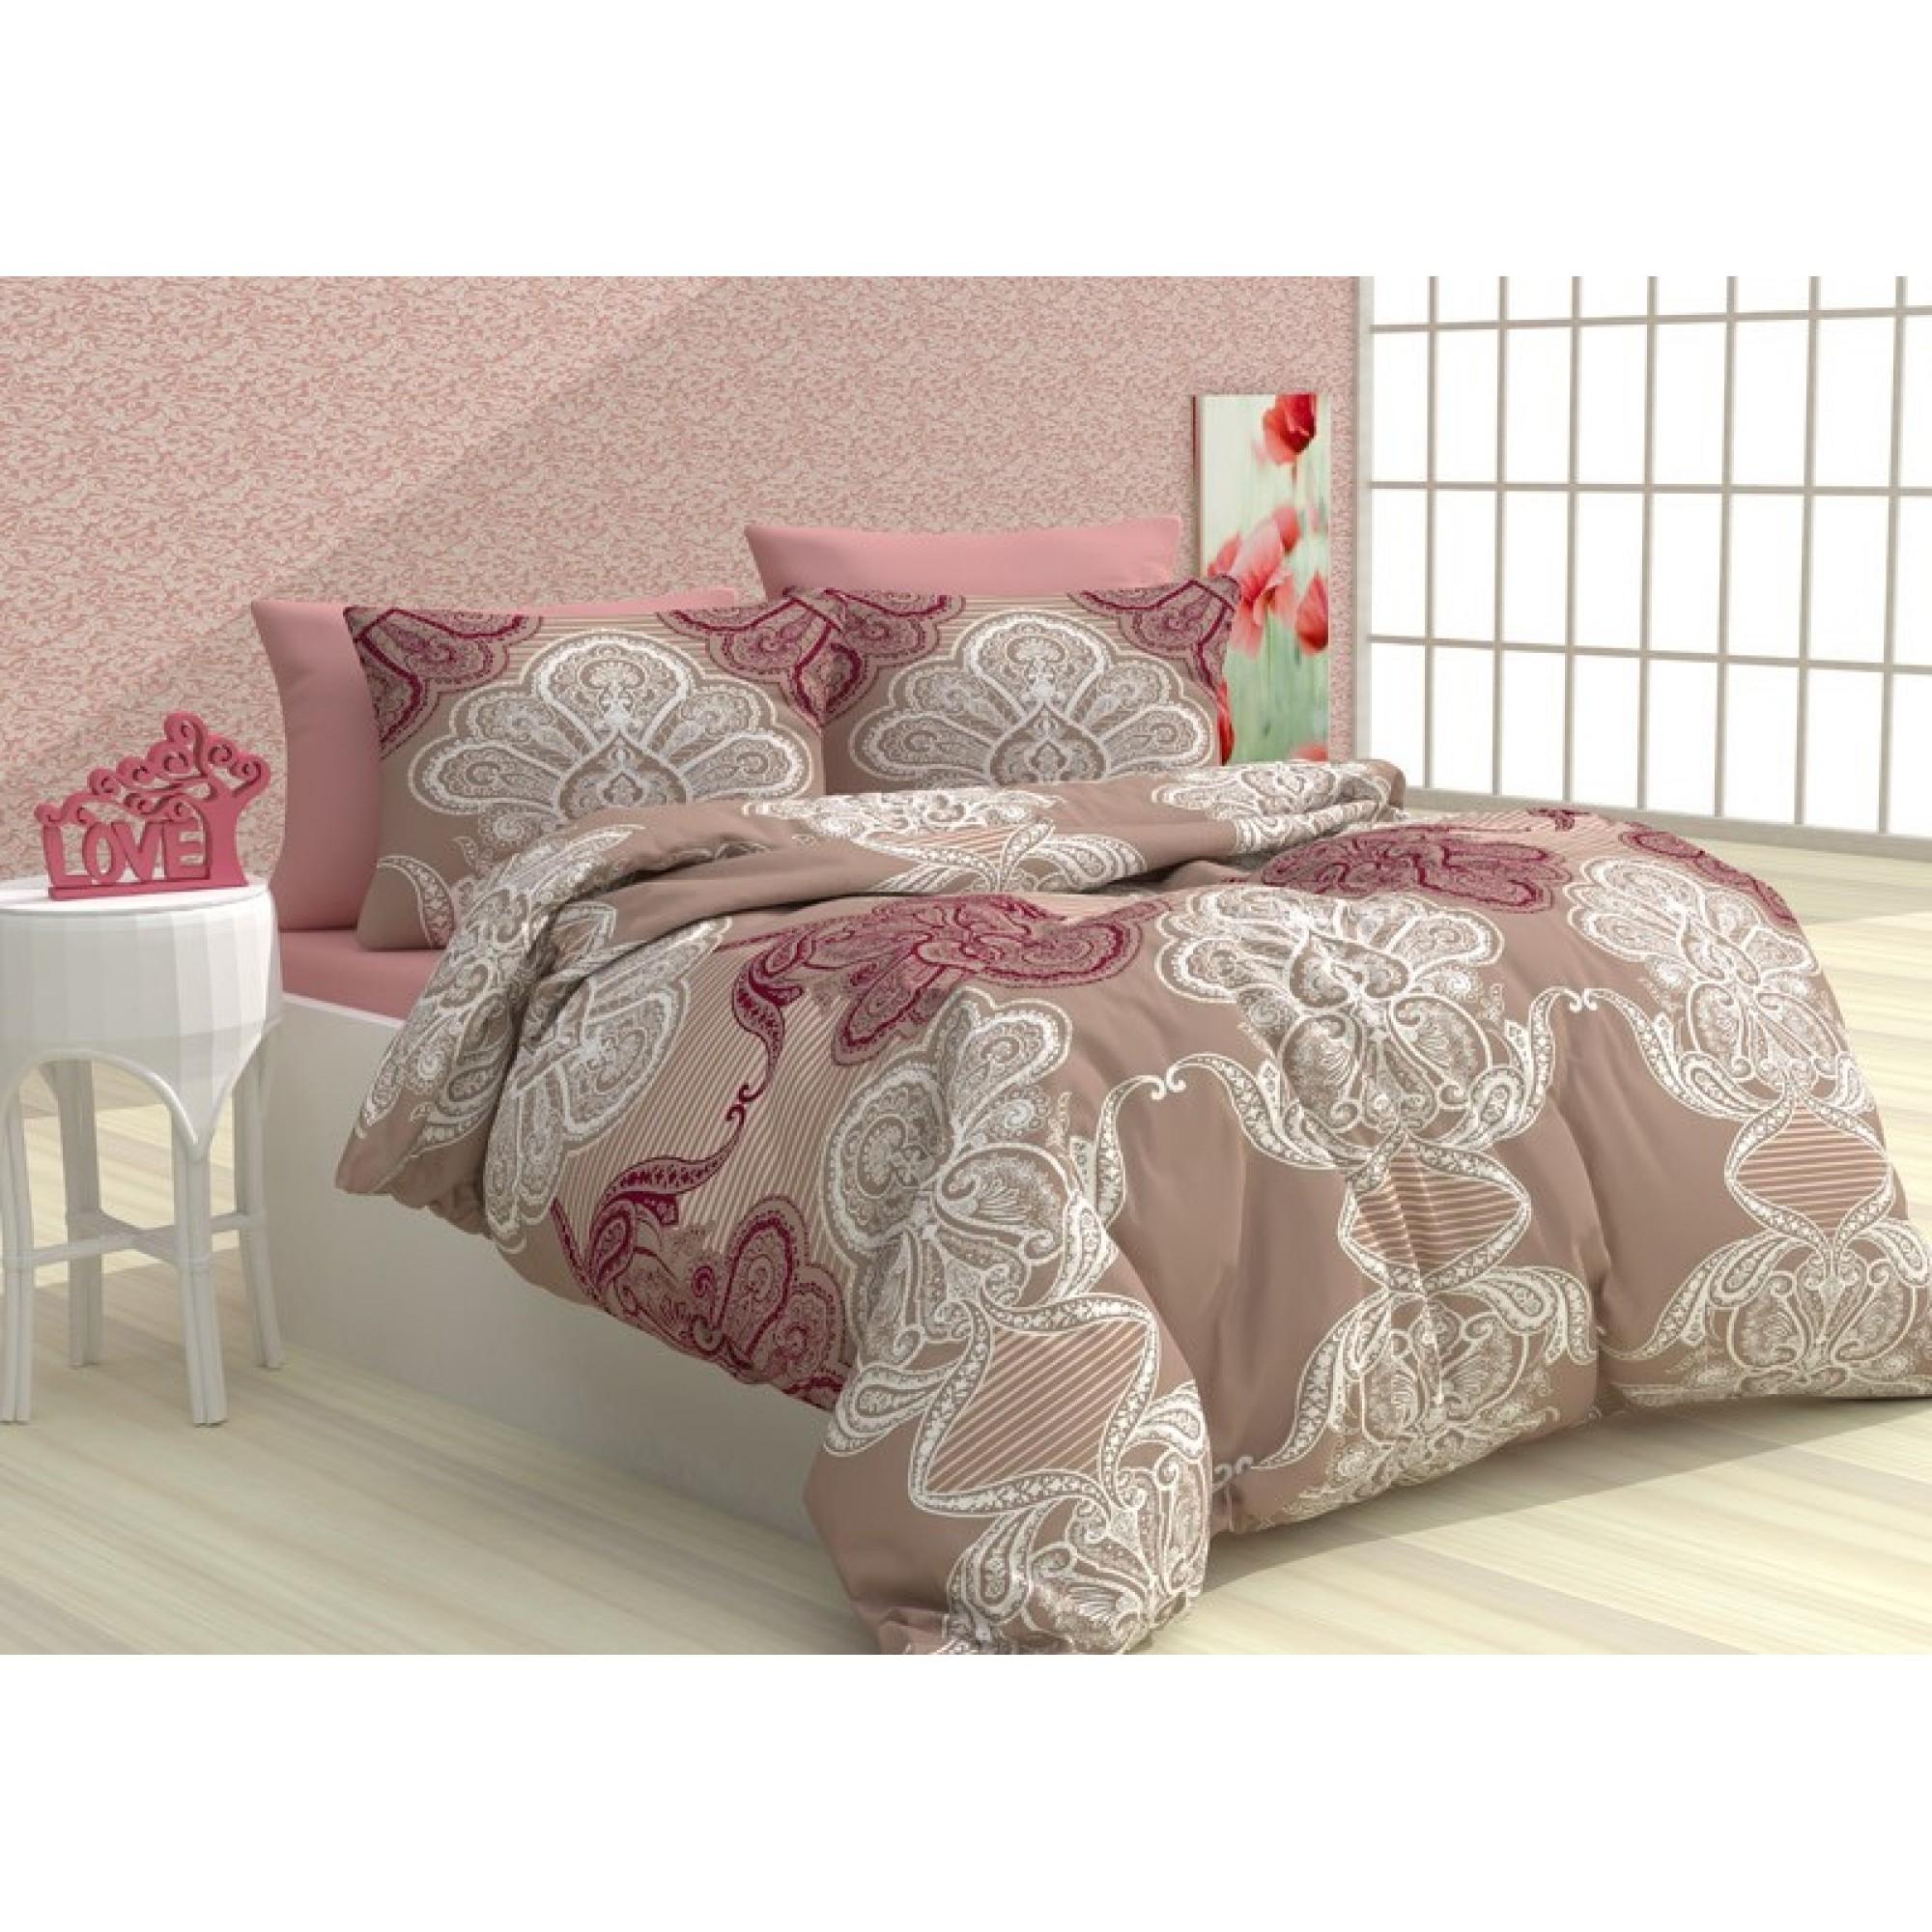 Prety Спално бельо 100% Памук